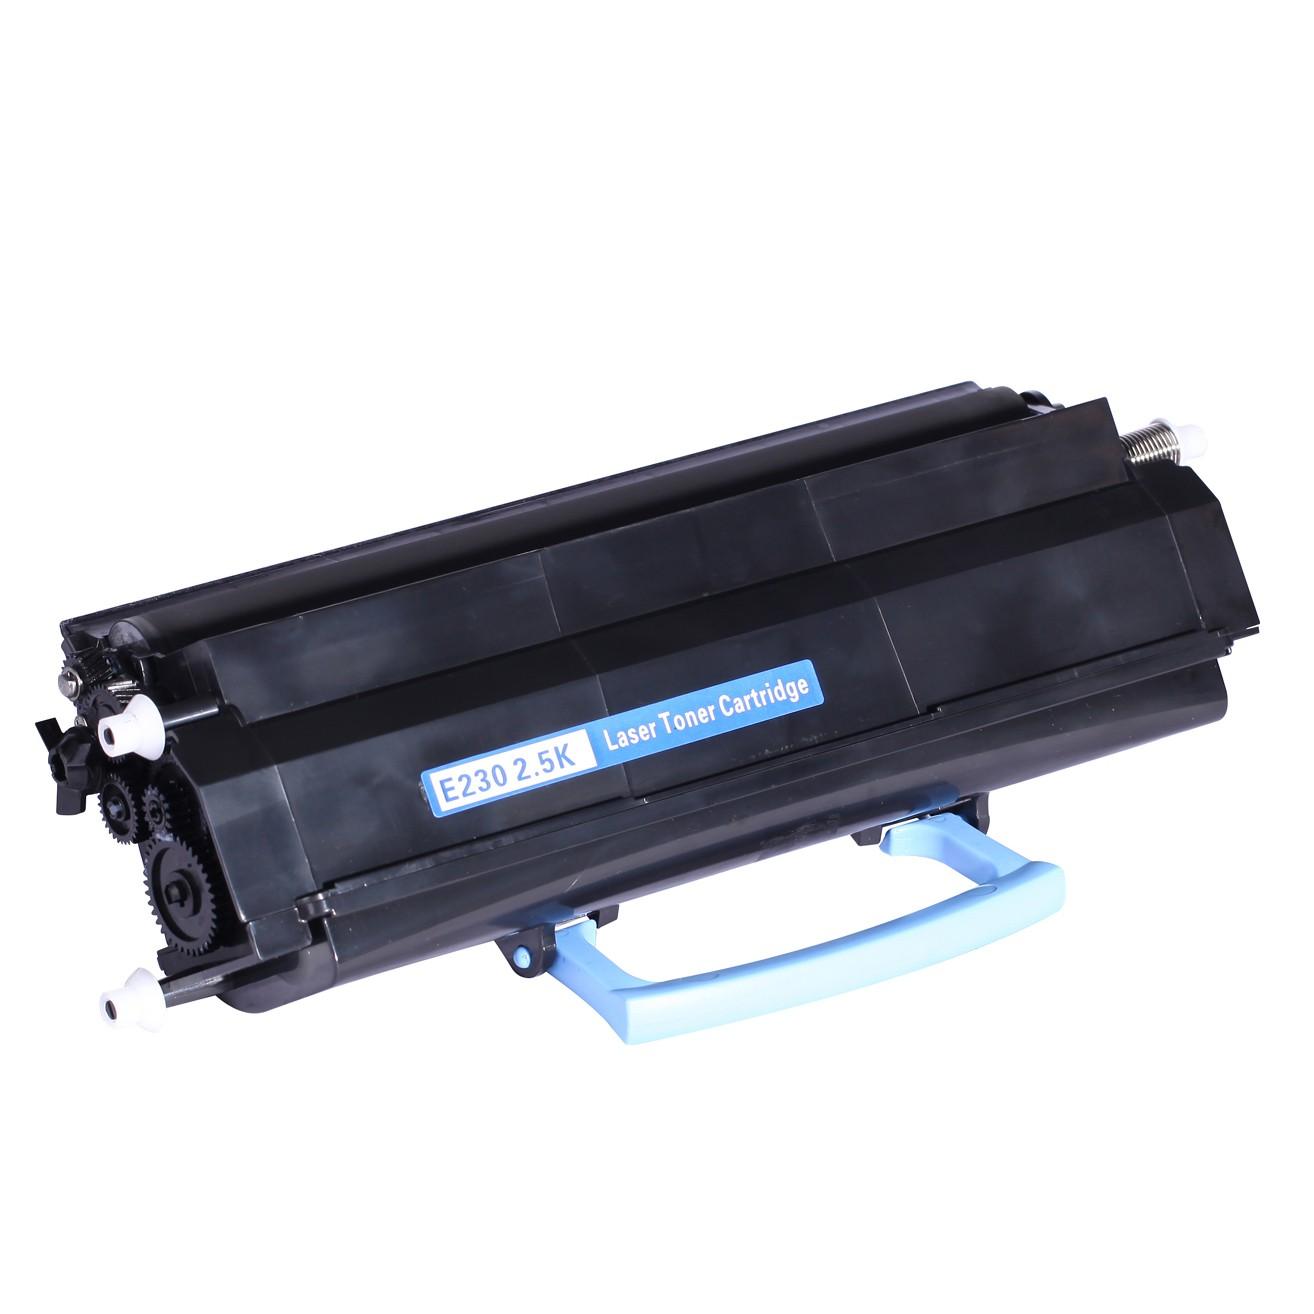 Lexmark E230 2.5K Lasertoner, sort, kompatibel (2500 sider)